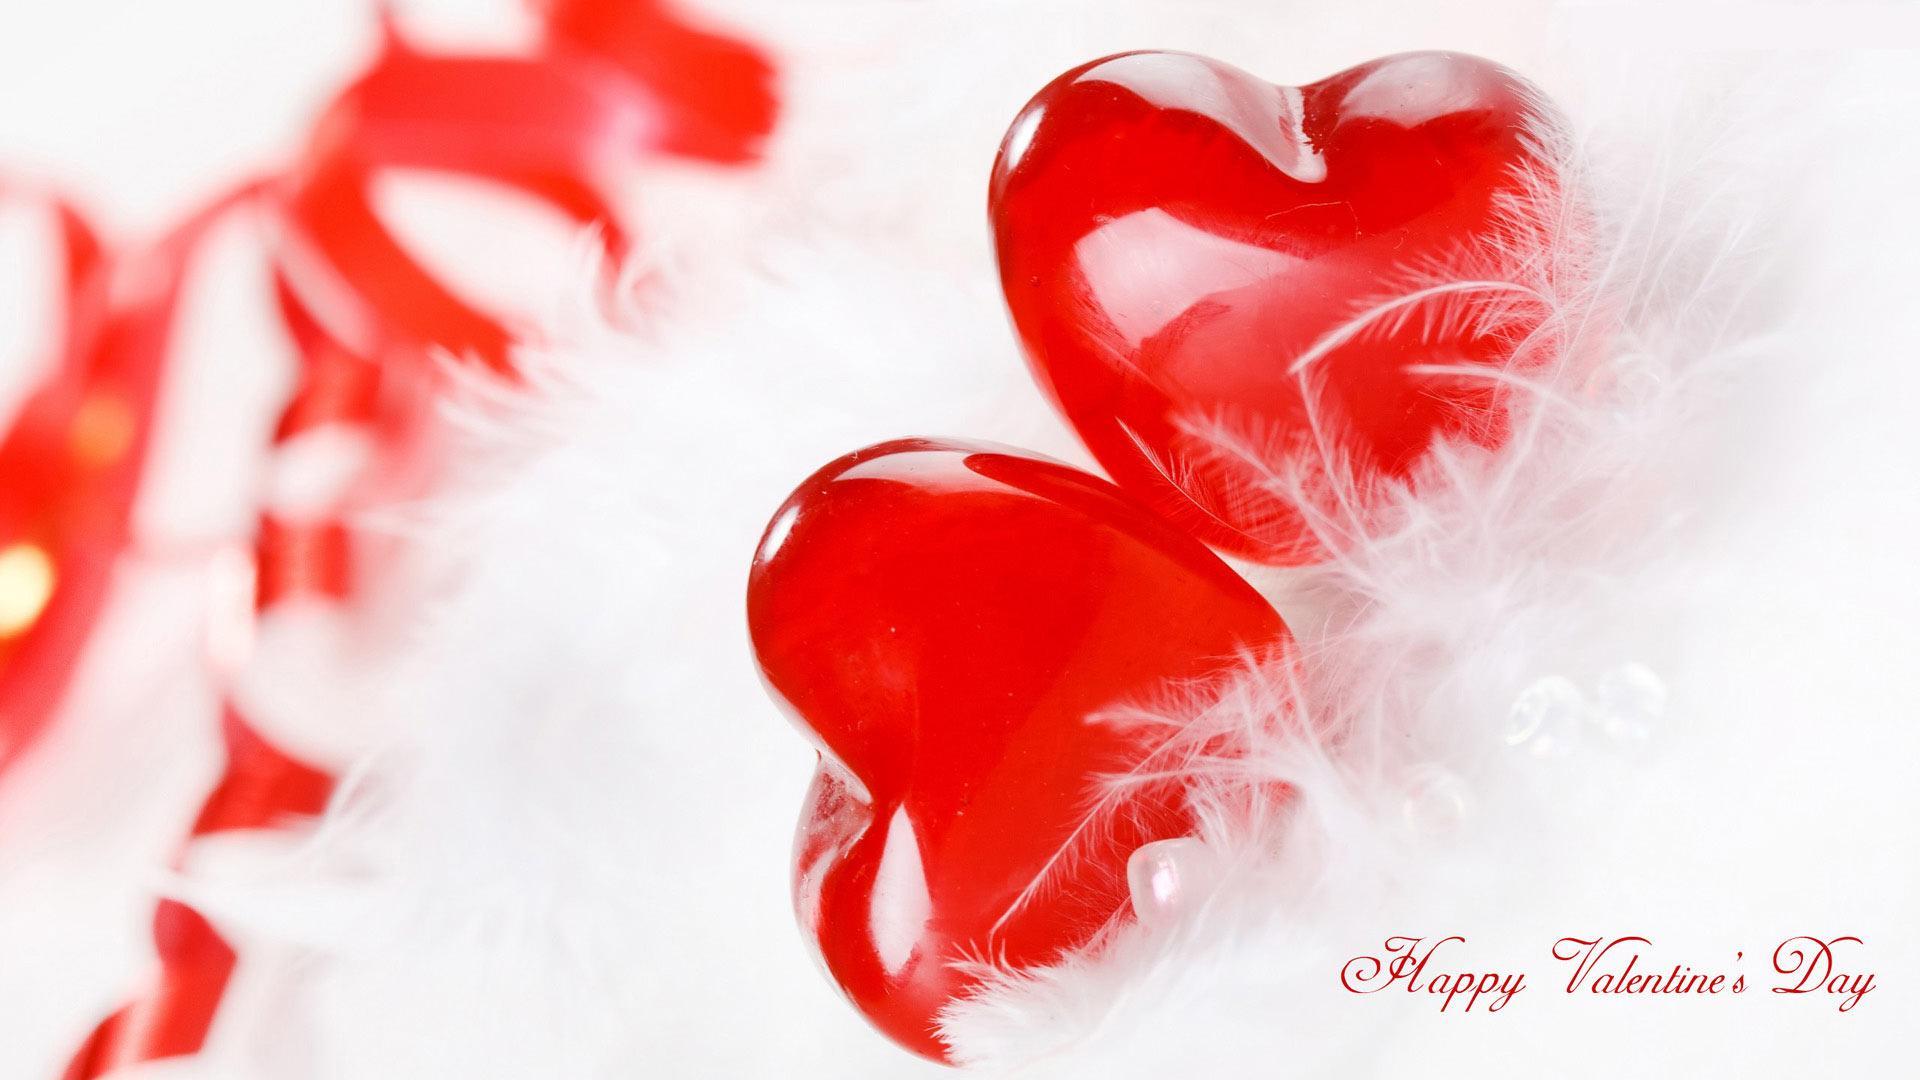 Valentines Day Desktop 31 Background Hdlovewallcom